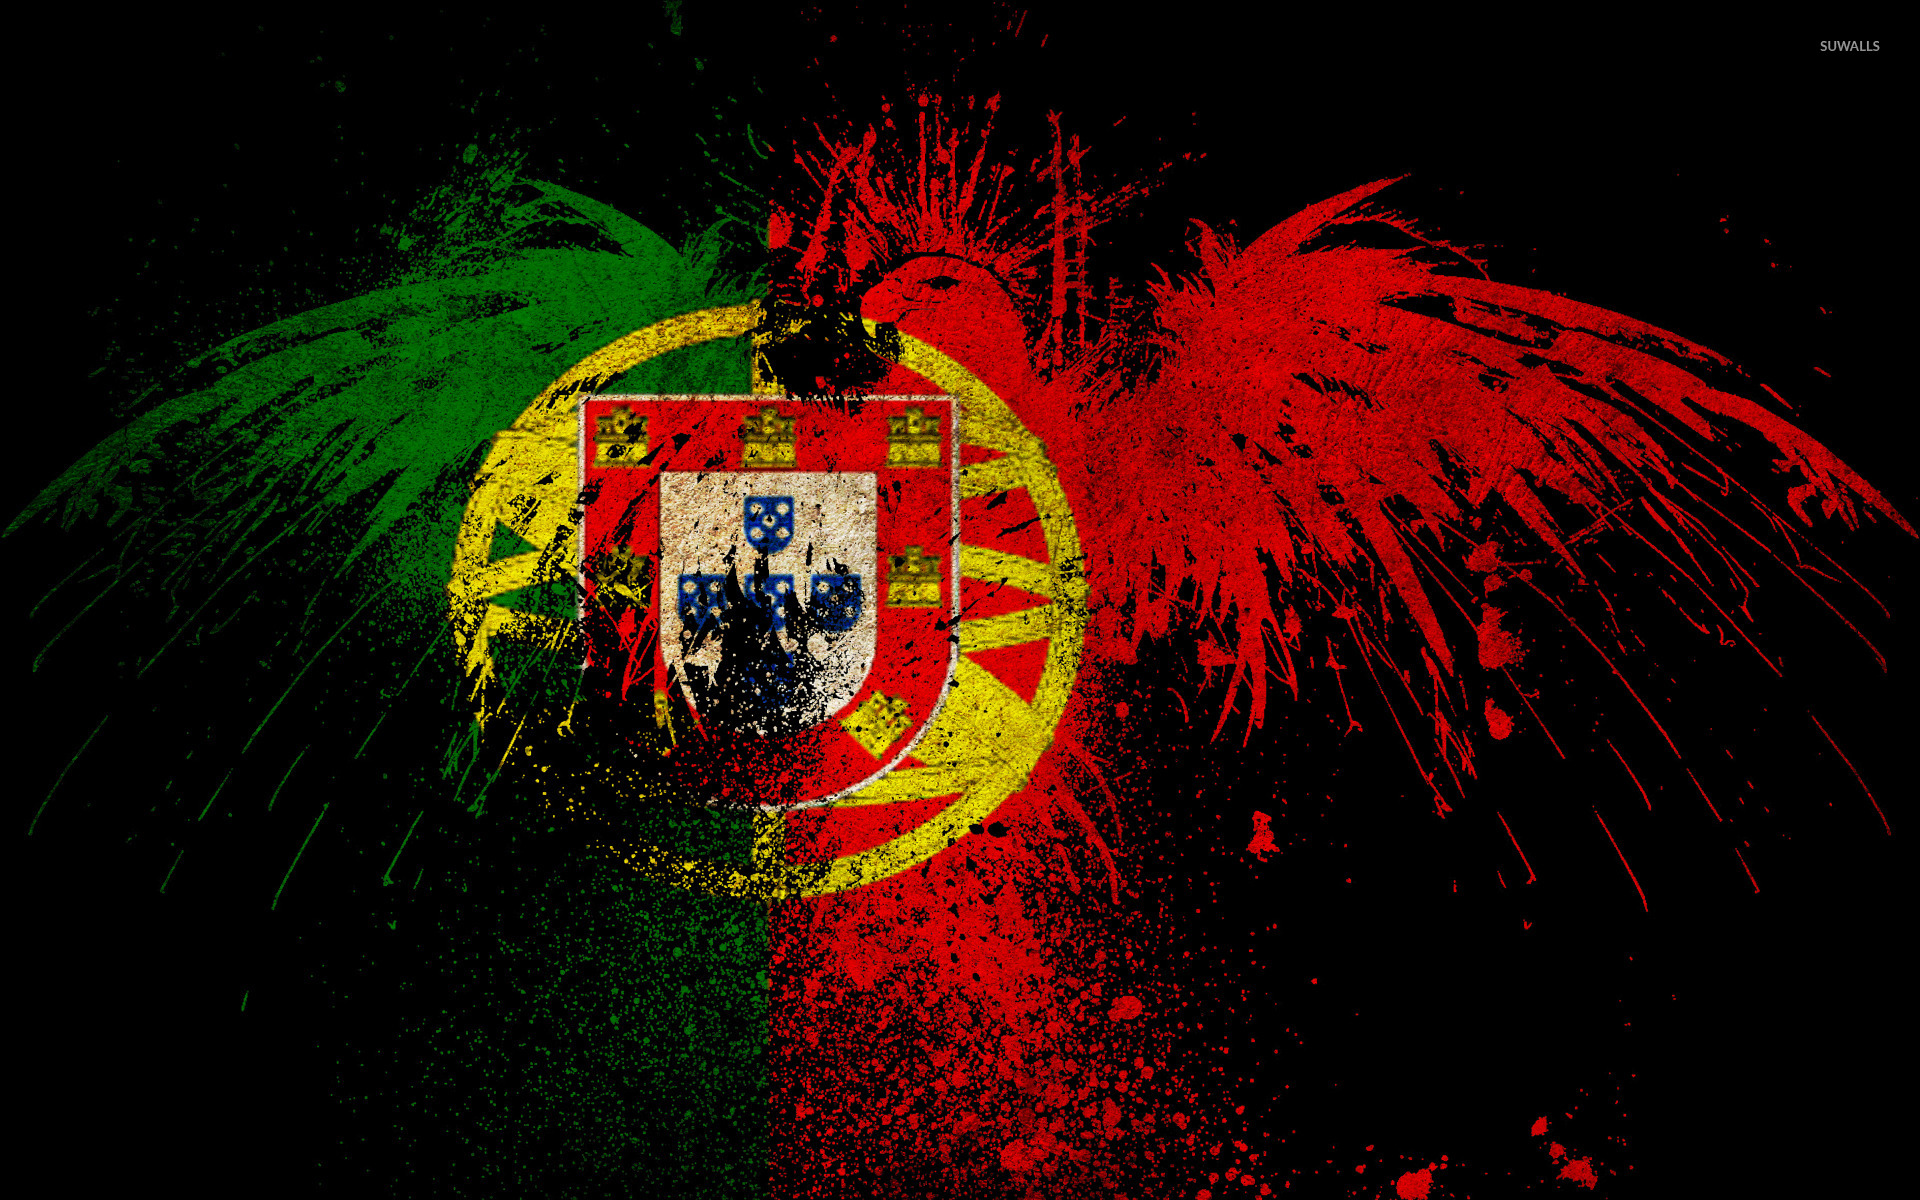 portugal wallpaper - photo #36